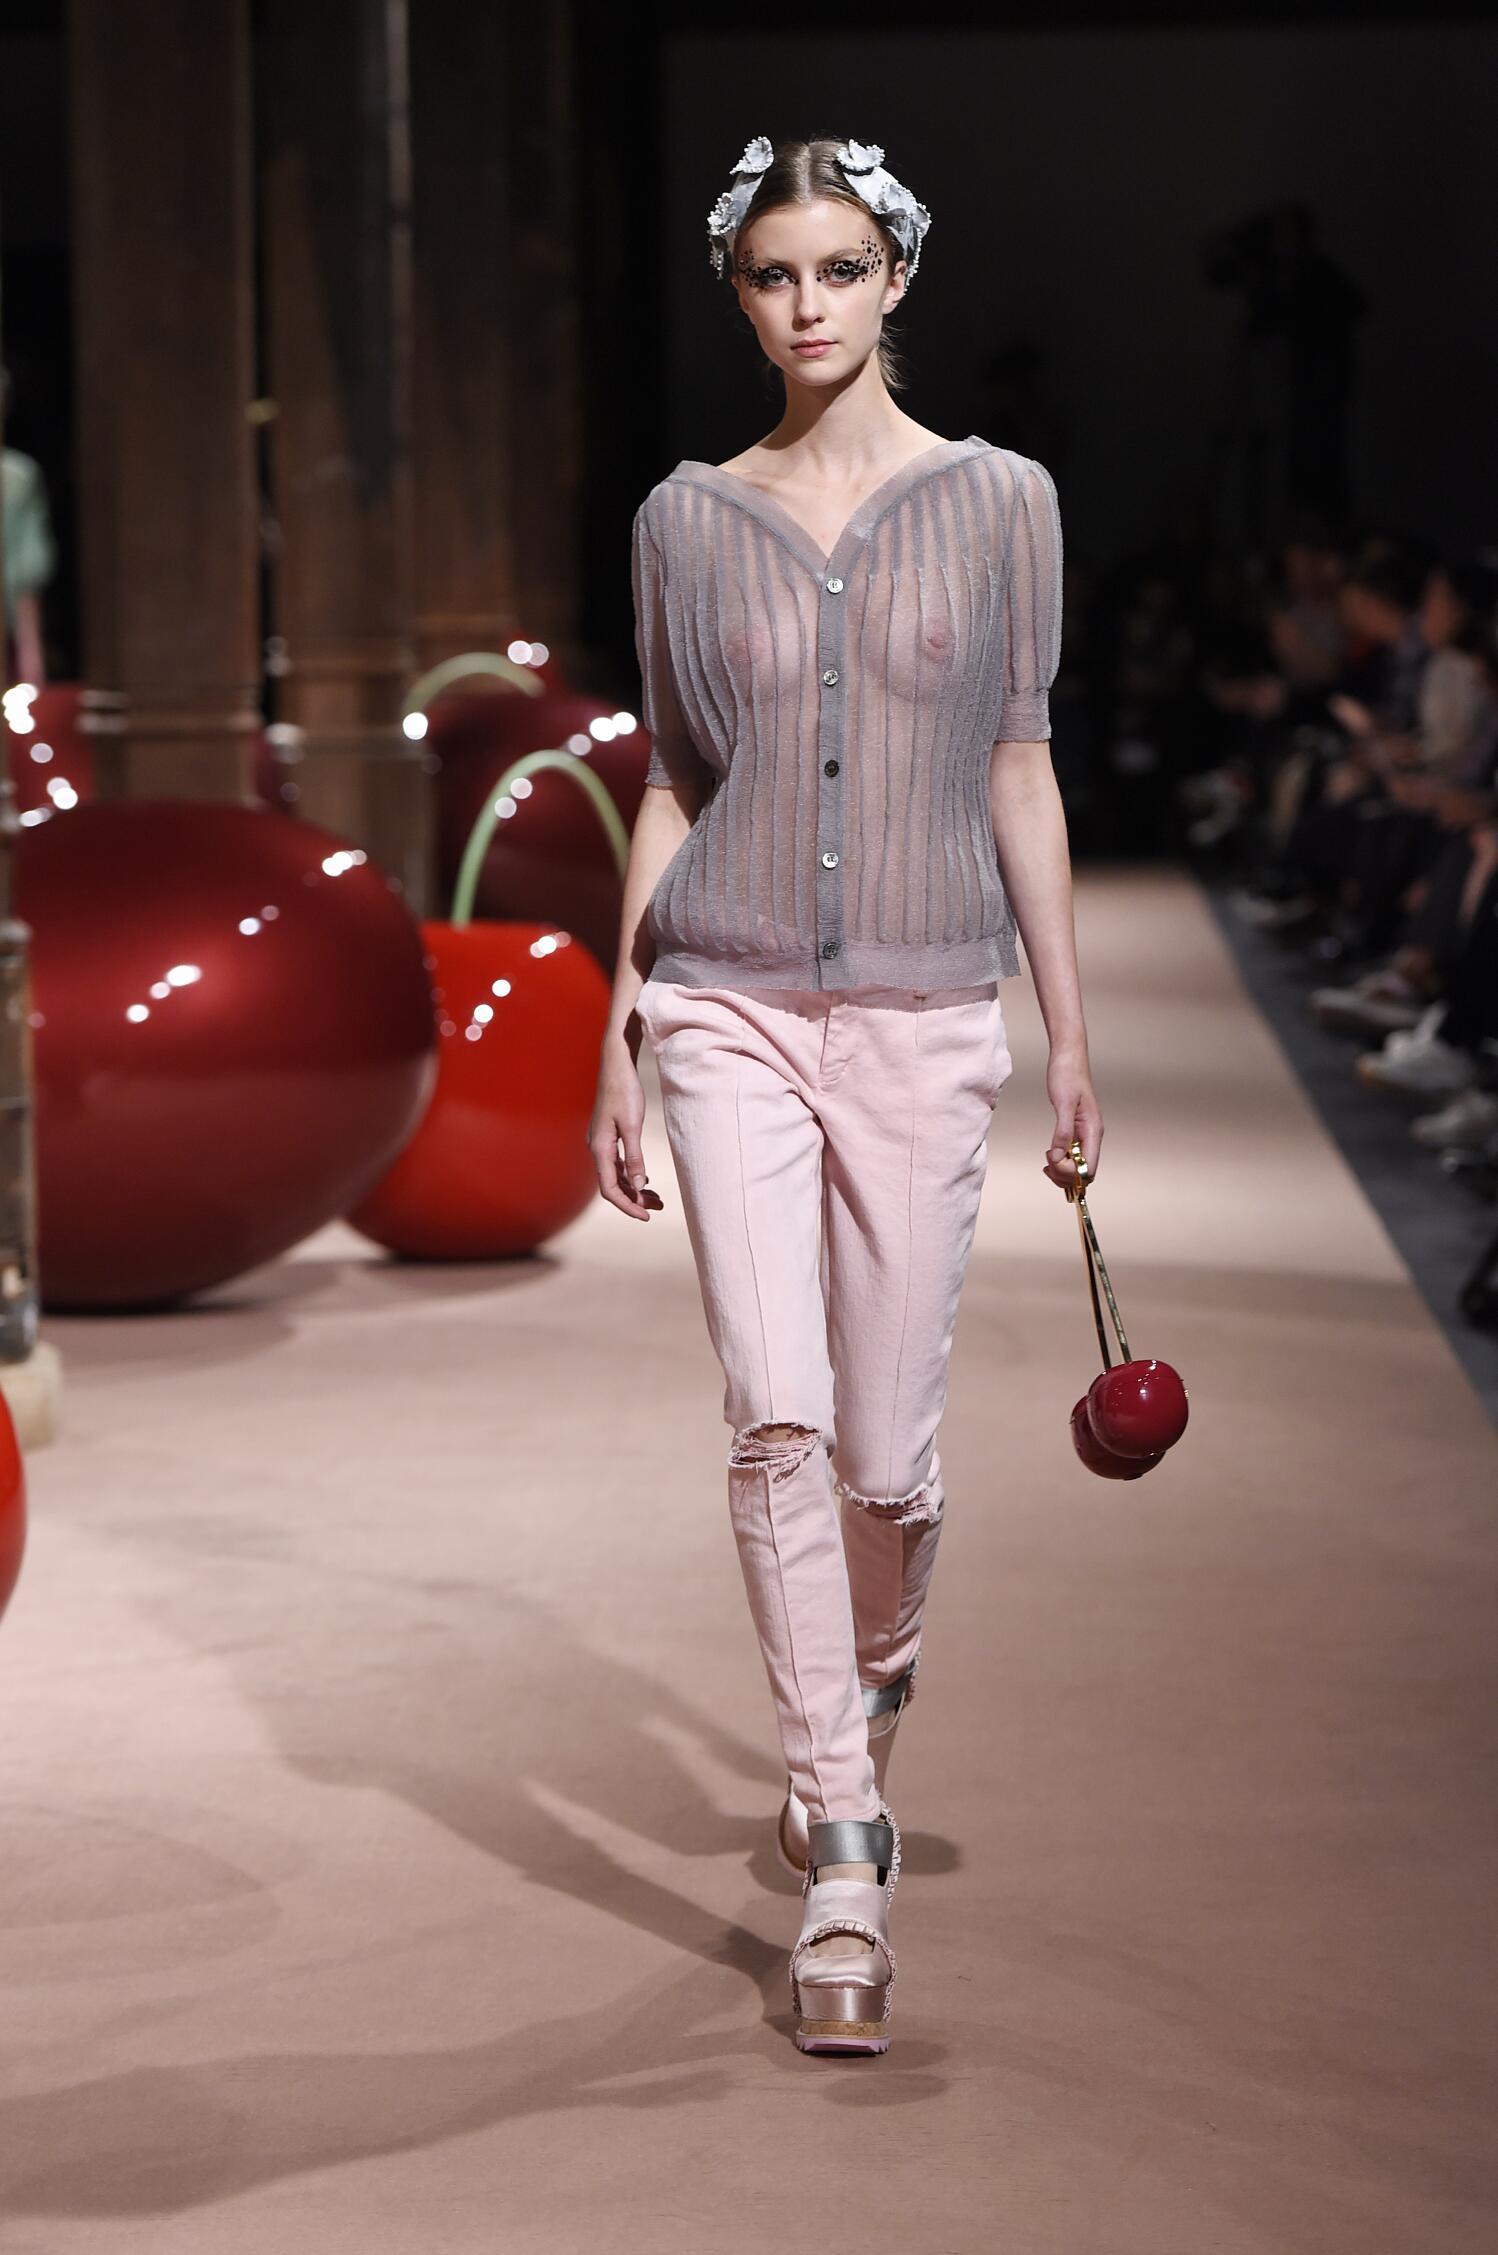 Runway Undercover Spring Summer 2015 Women's Collection Paris Fashion Week